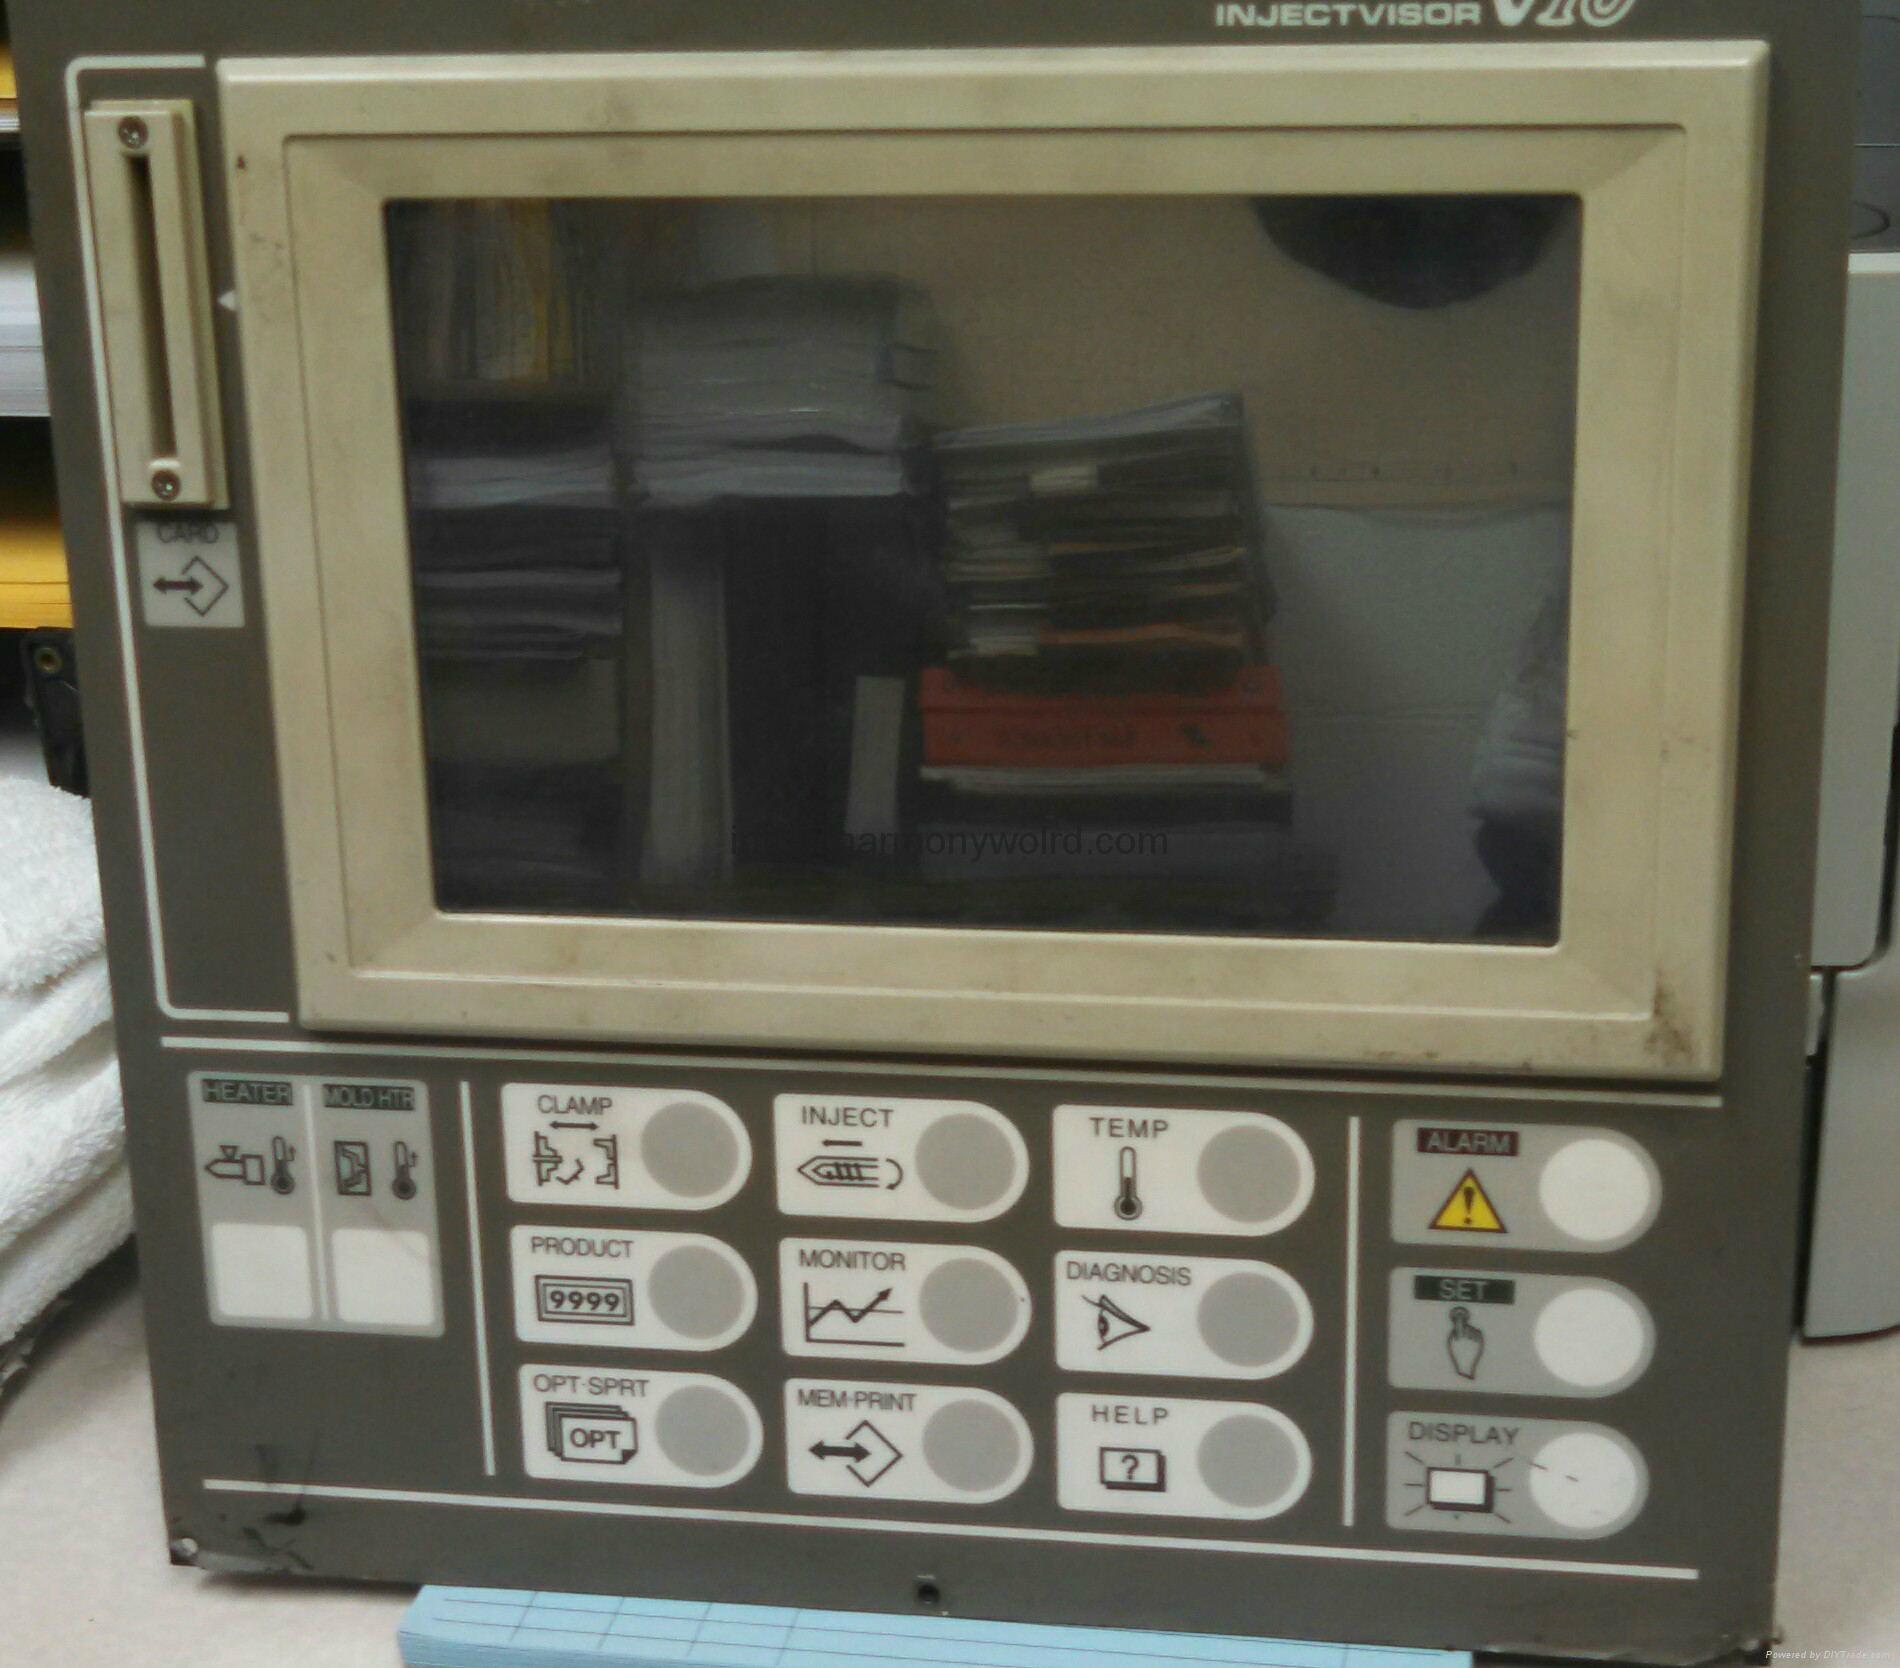 Monitor Display For Toshiba Injection Molding Machine injectvisor VL/V10/V21/V30 19